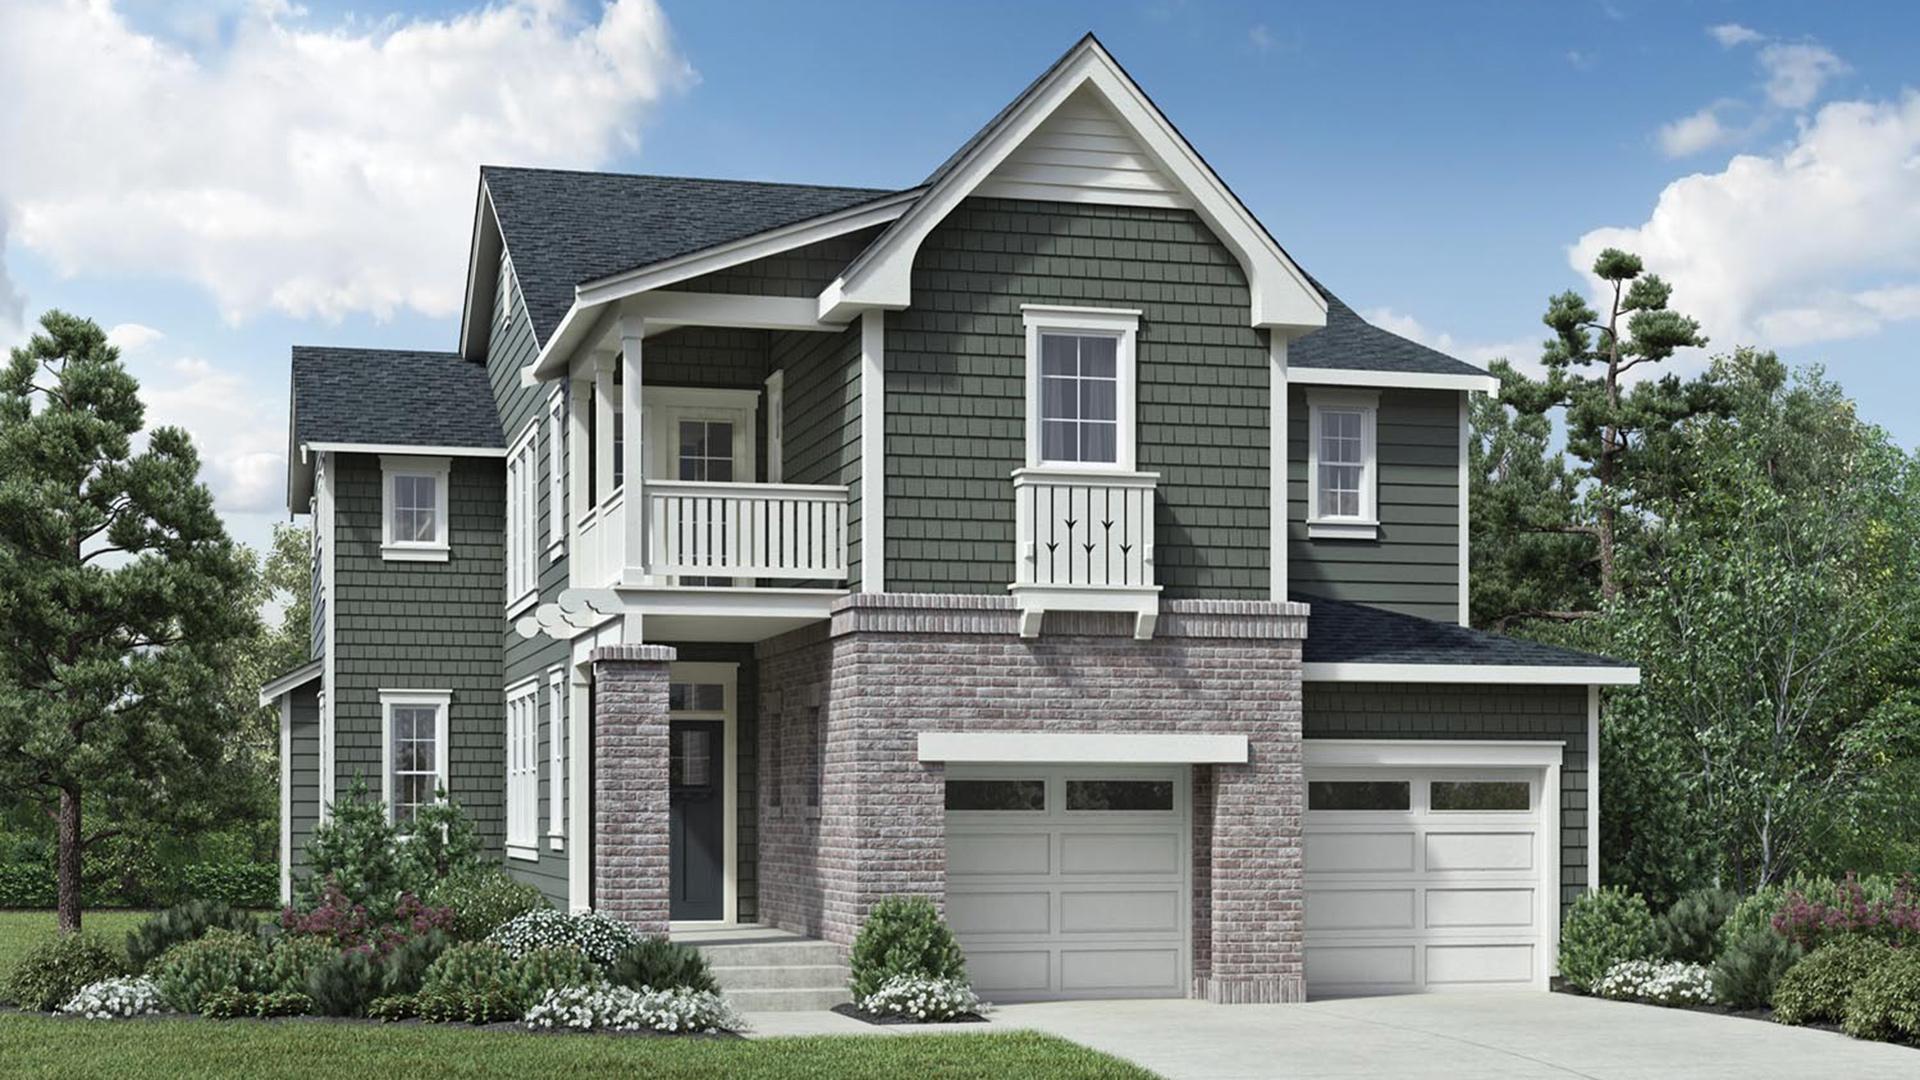 Alderbrook Lane The Kingston Wa Home Design